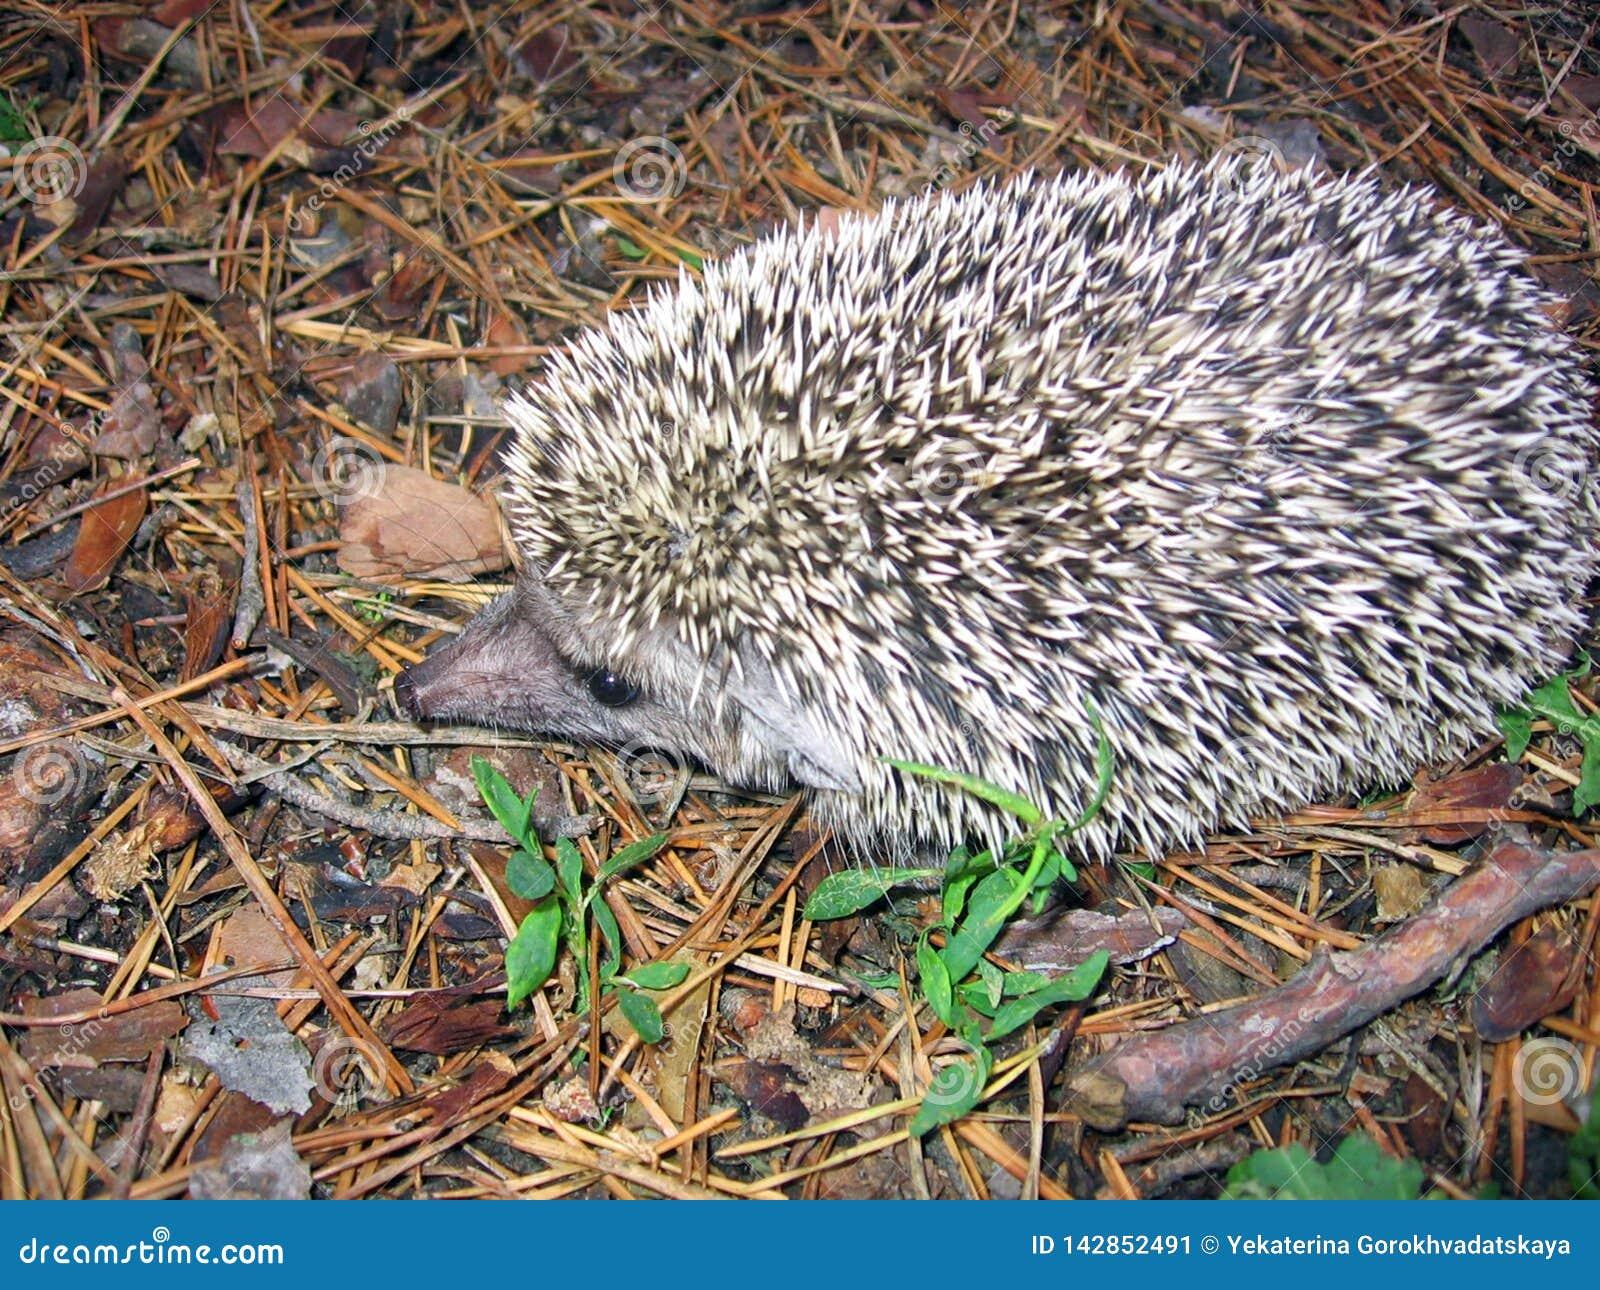 Hedgehog on spruce needles background